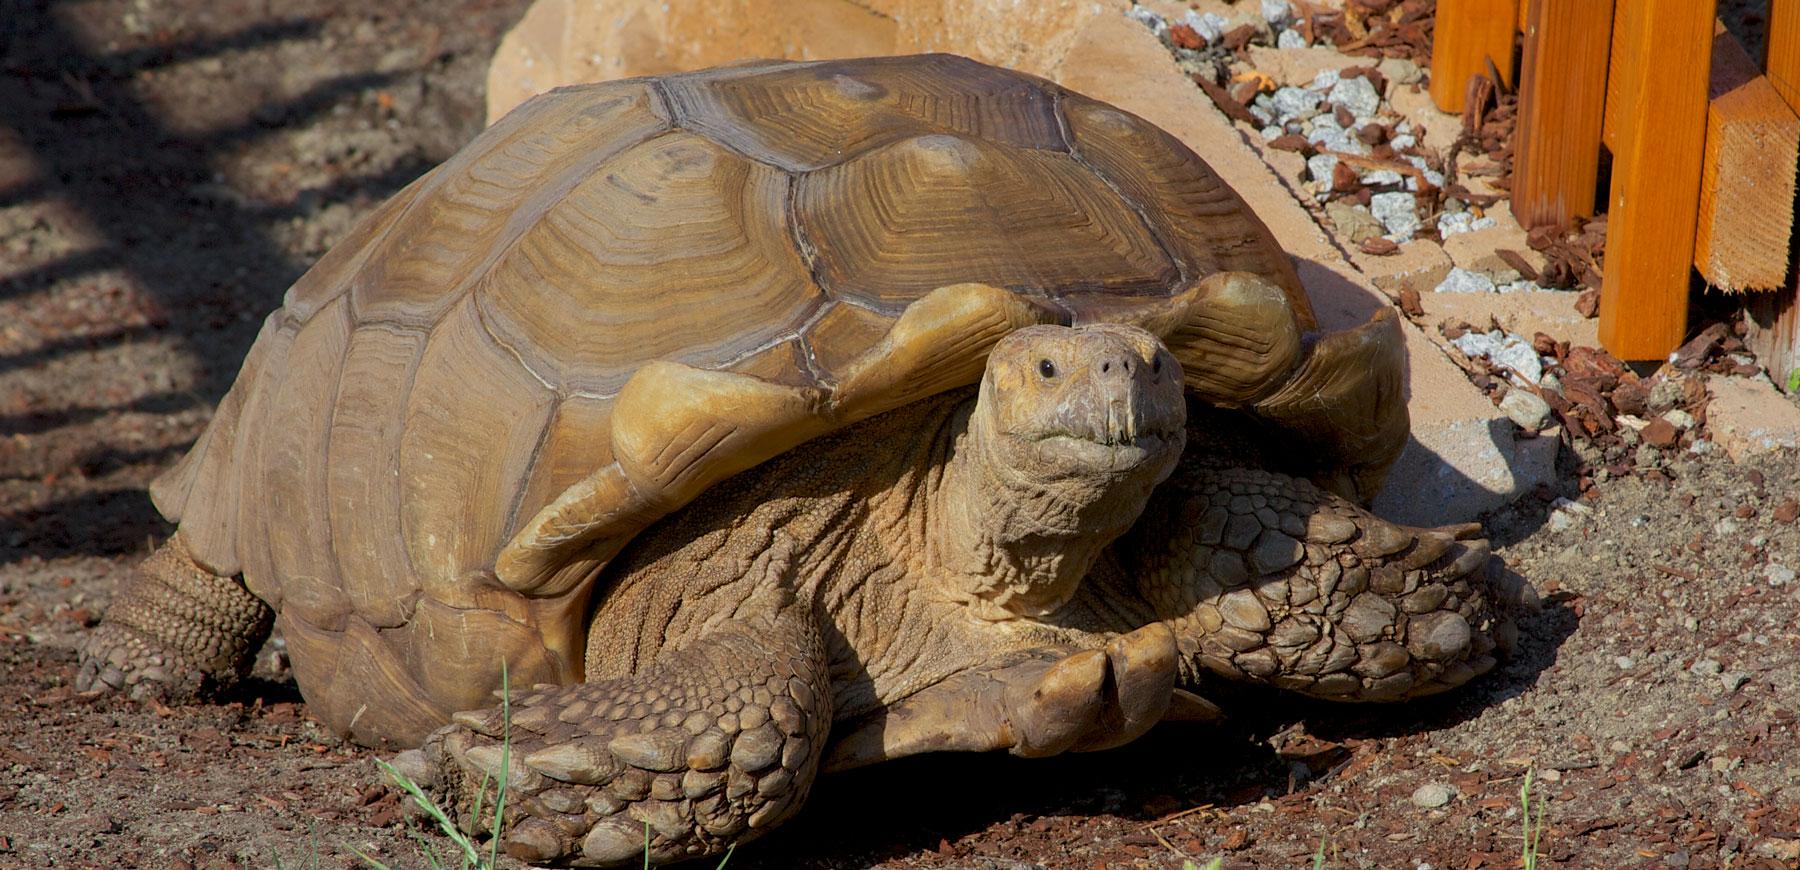 hight resolution of sulcata tortoise